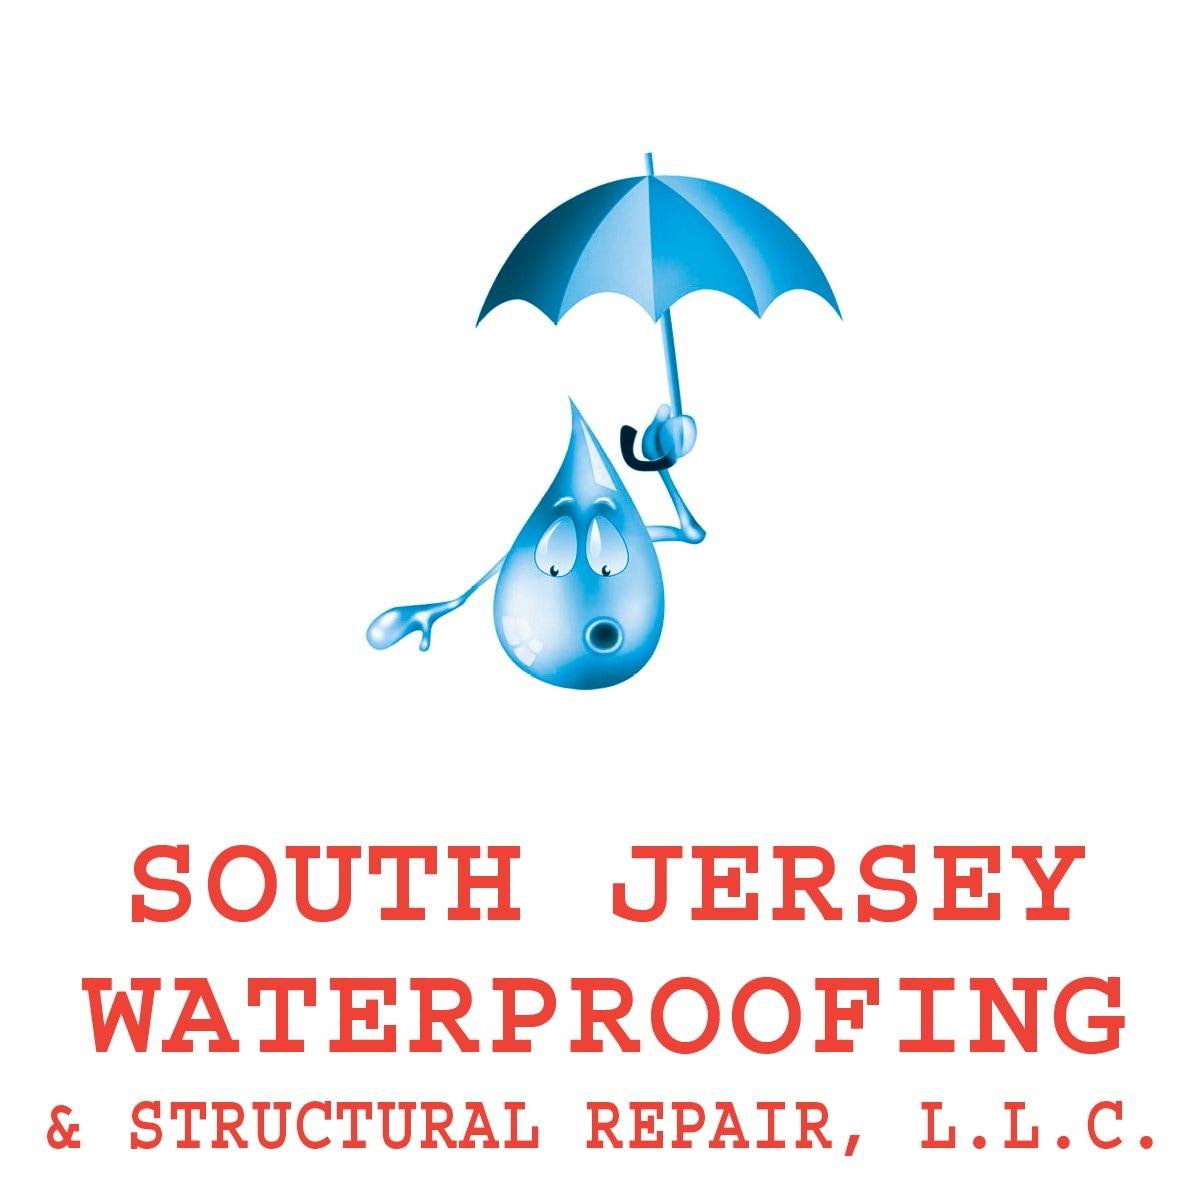 South Jersey Waterproofing & Structural Repair LLC